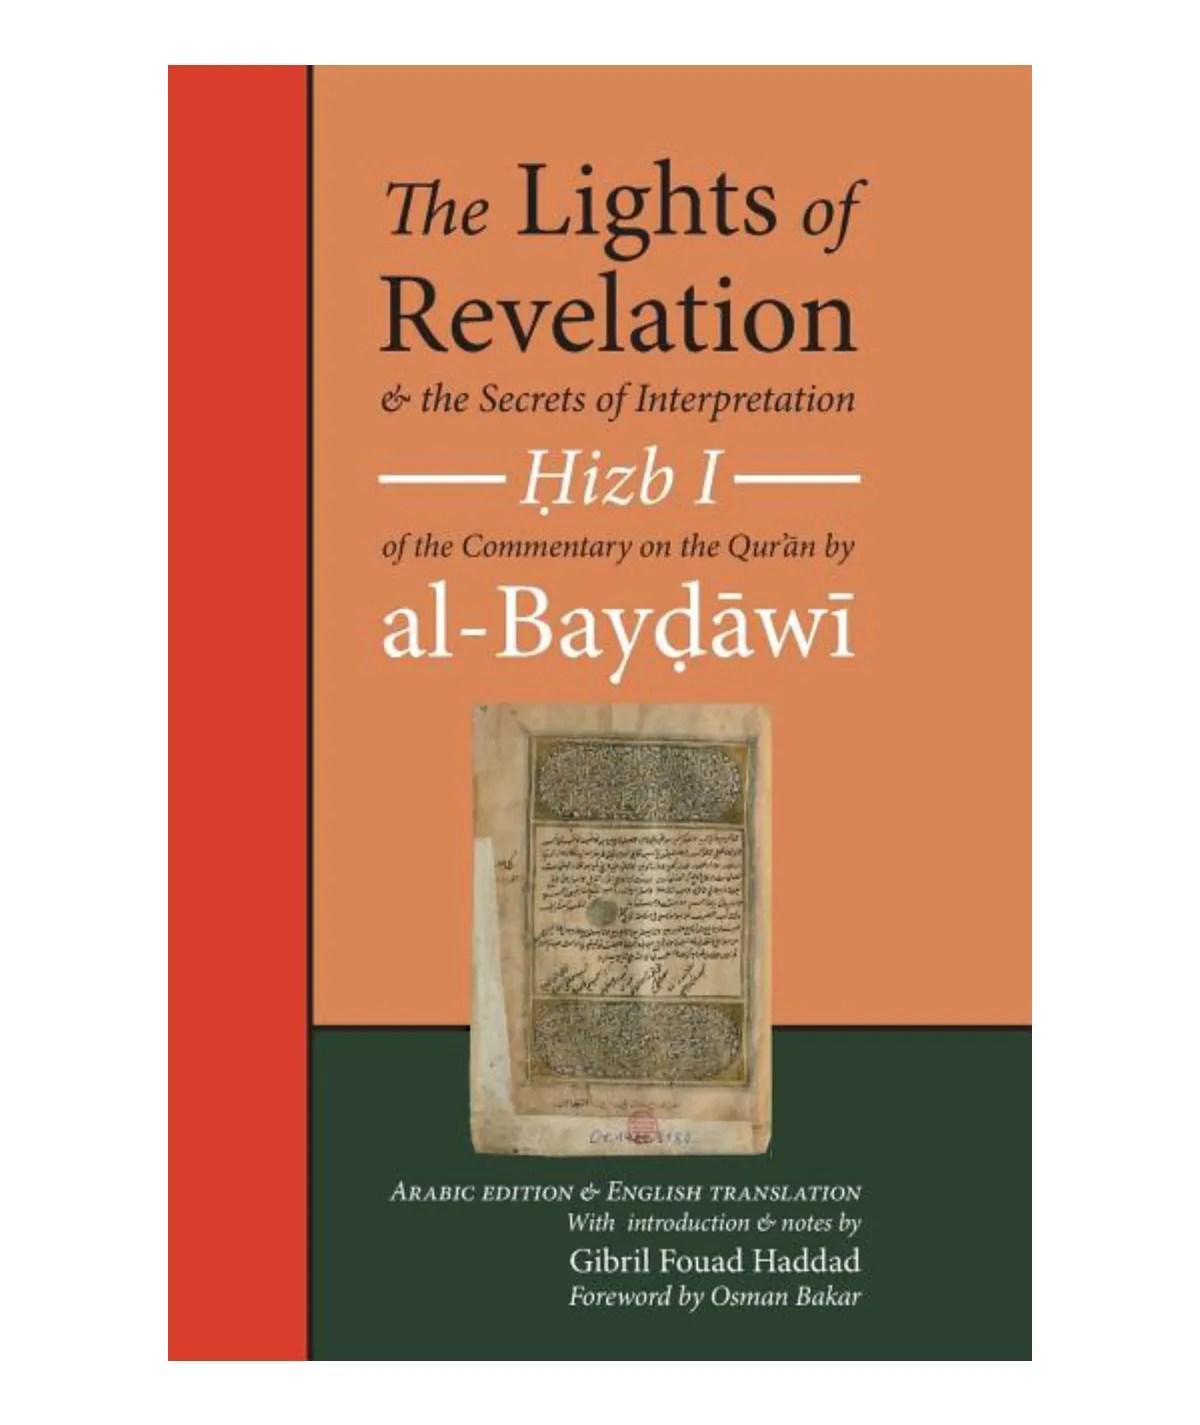 The Lights of Revelation and the Secrets of Interpretation: Hizb One of the Commentary on the Qurʾan by al-Baydawi: Al-Baydawi, ʿabd Allah Ibn ʿumar   Haddad, Gibril Fouad   Bakar, Osman